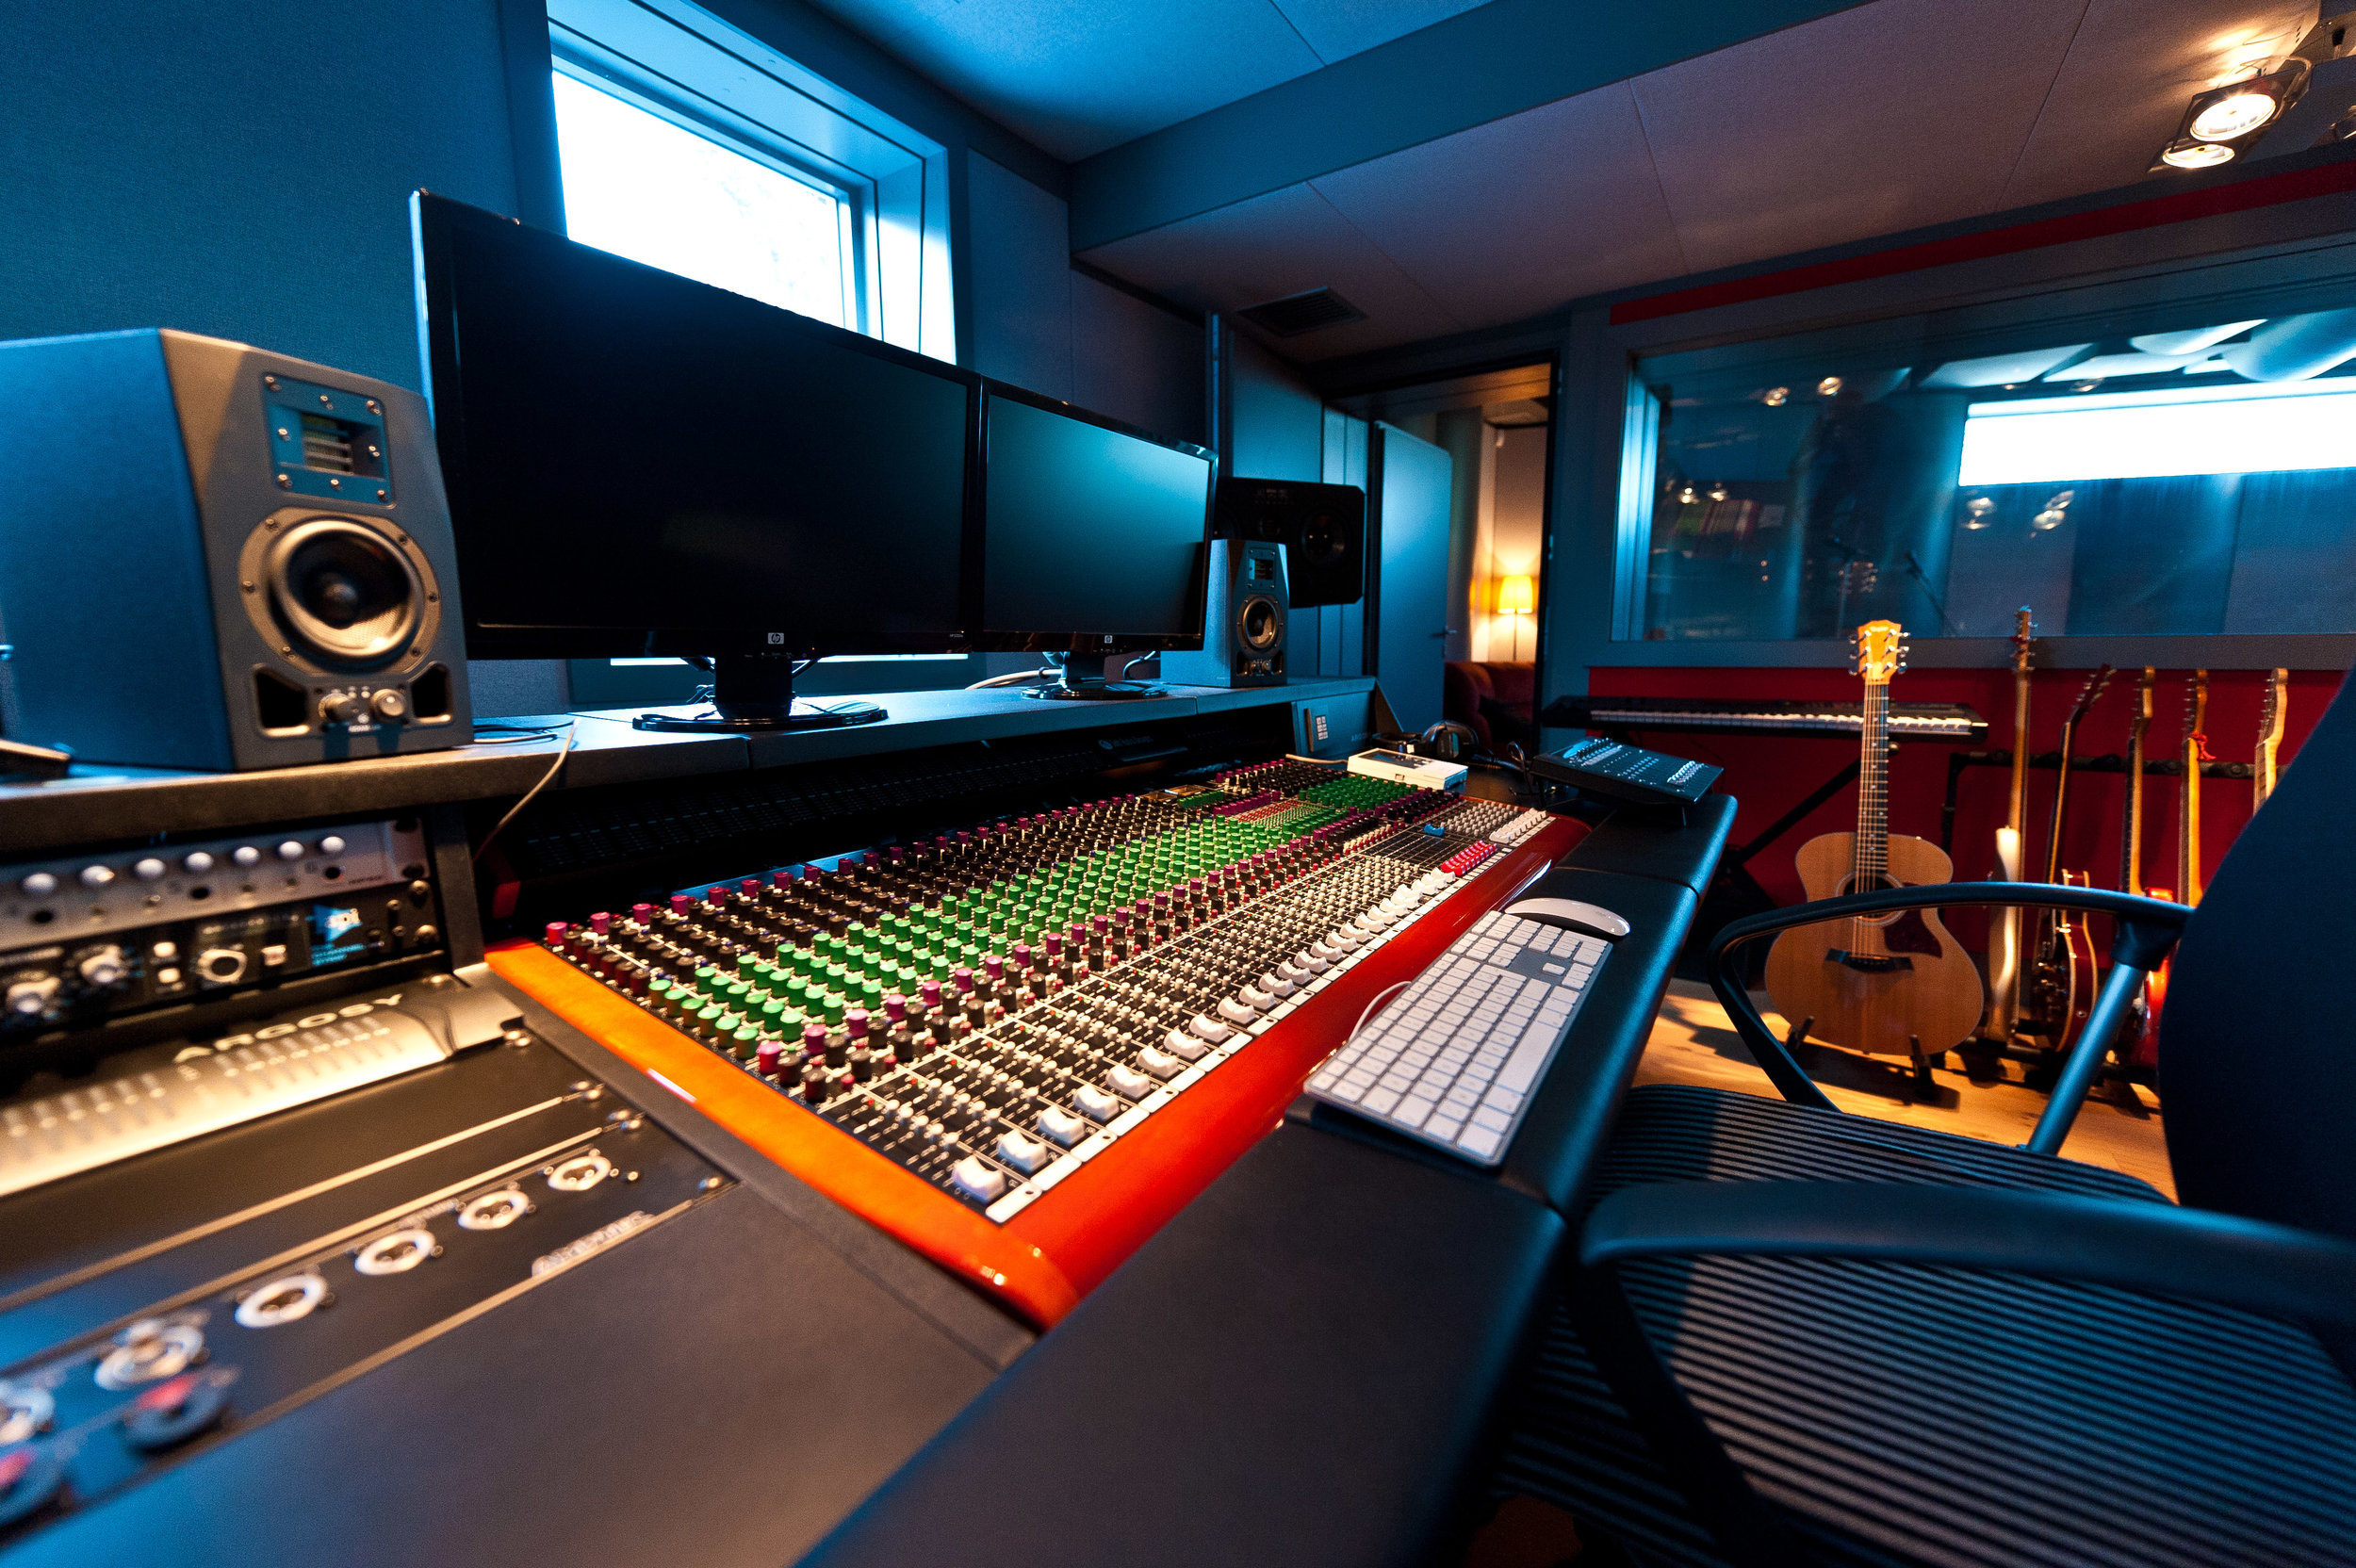 06-02-2012-sem-boutersem-013.jpg